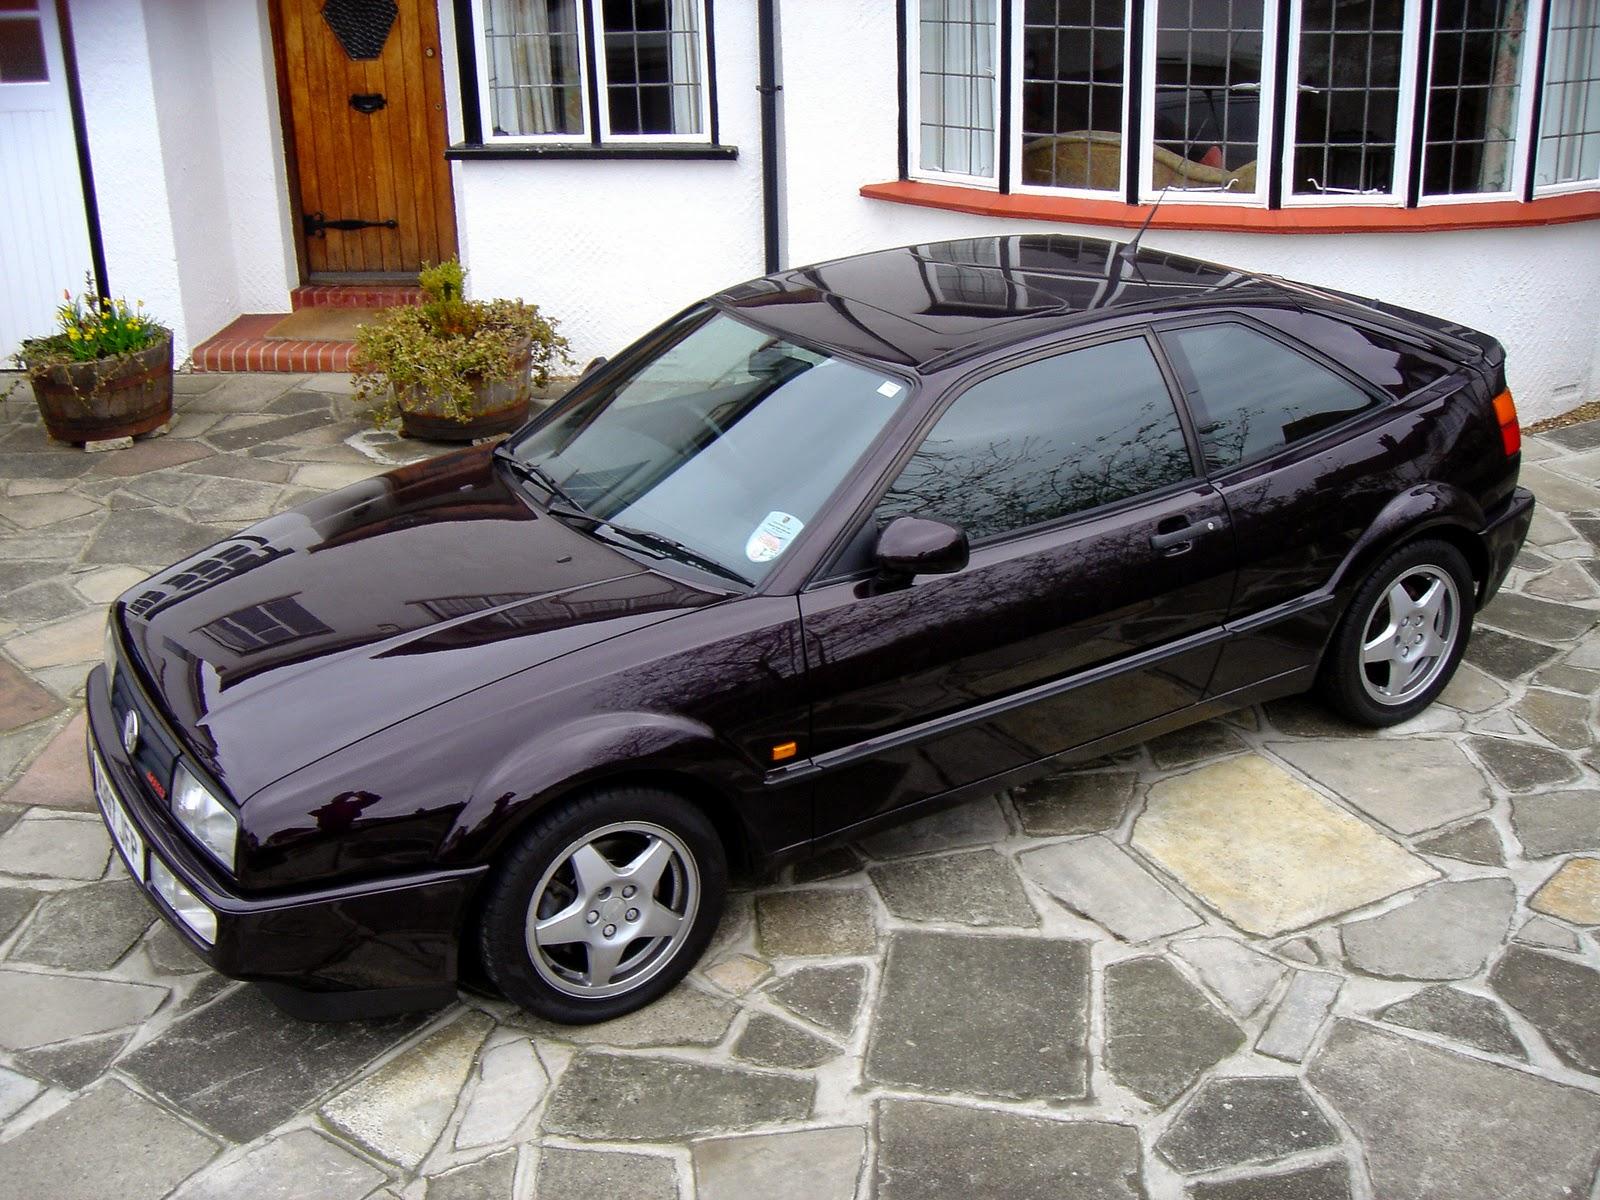 1994 VW Corrado Owners Manual